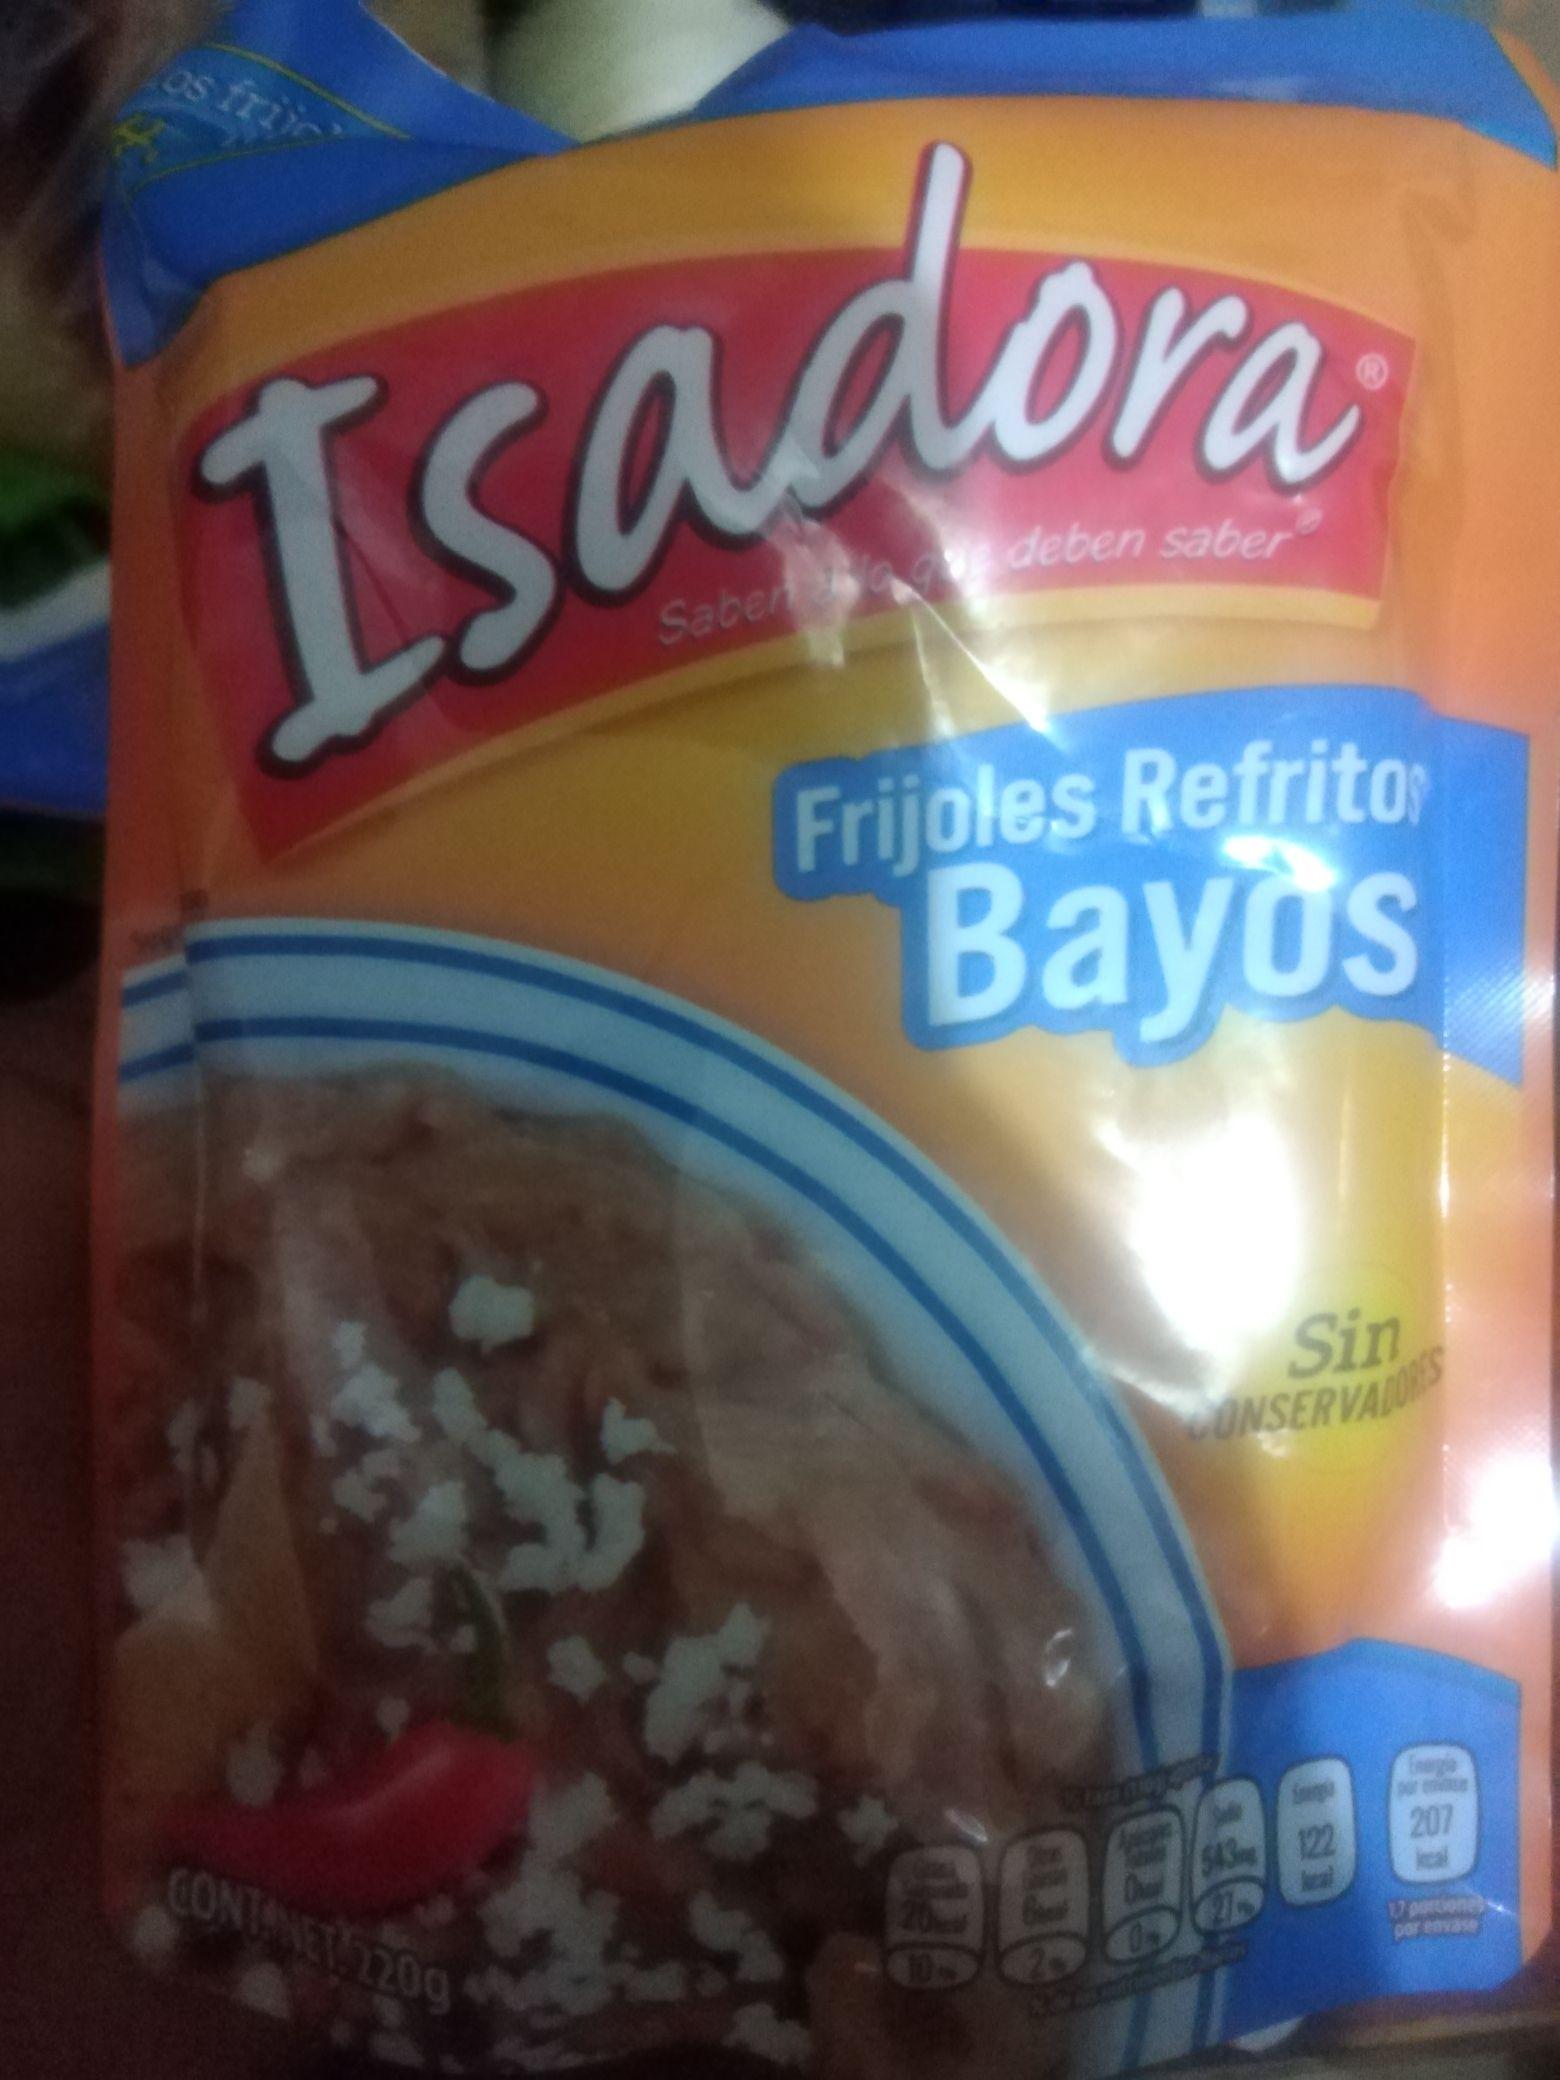 Chedraui: Frijoles isadora refritos bayos